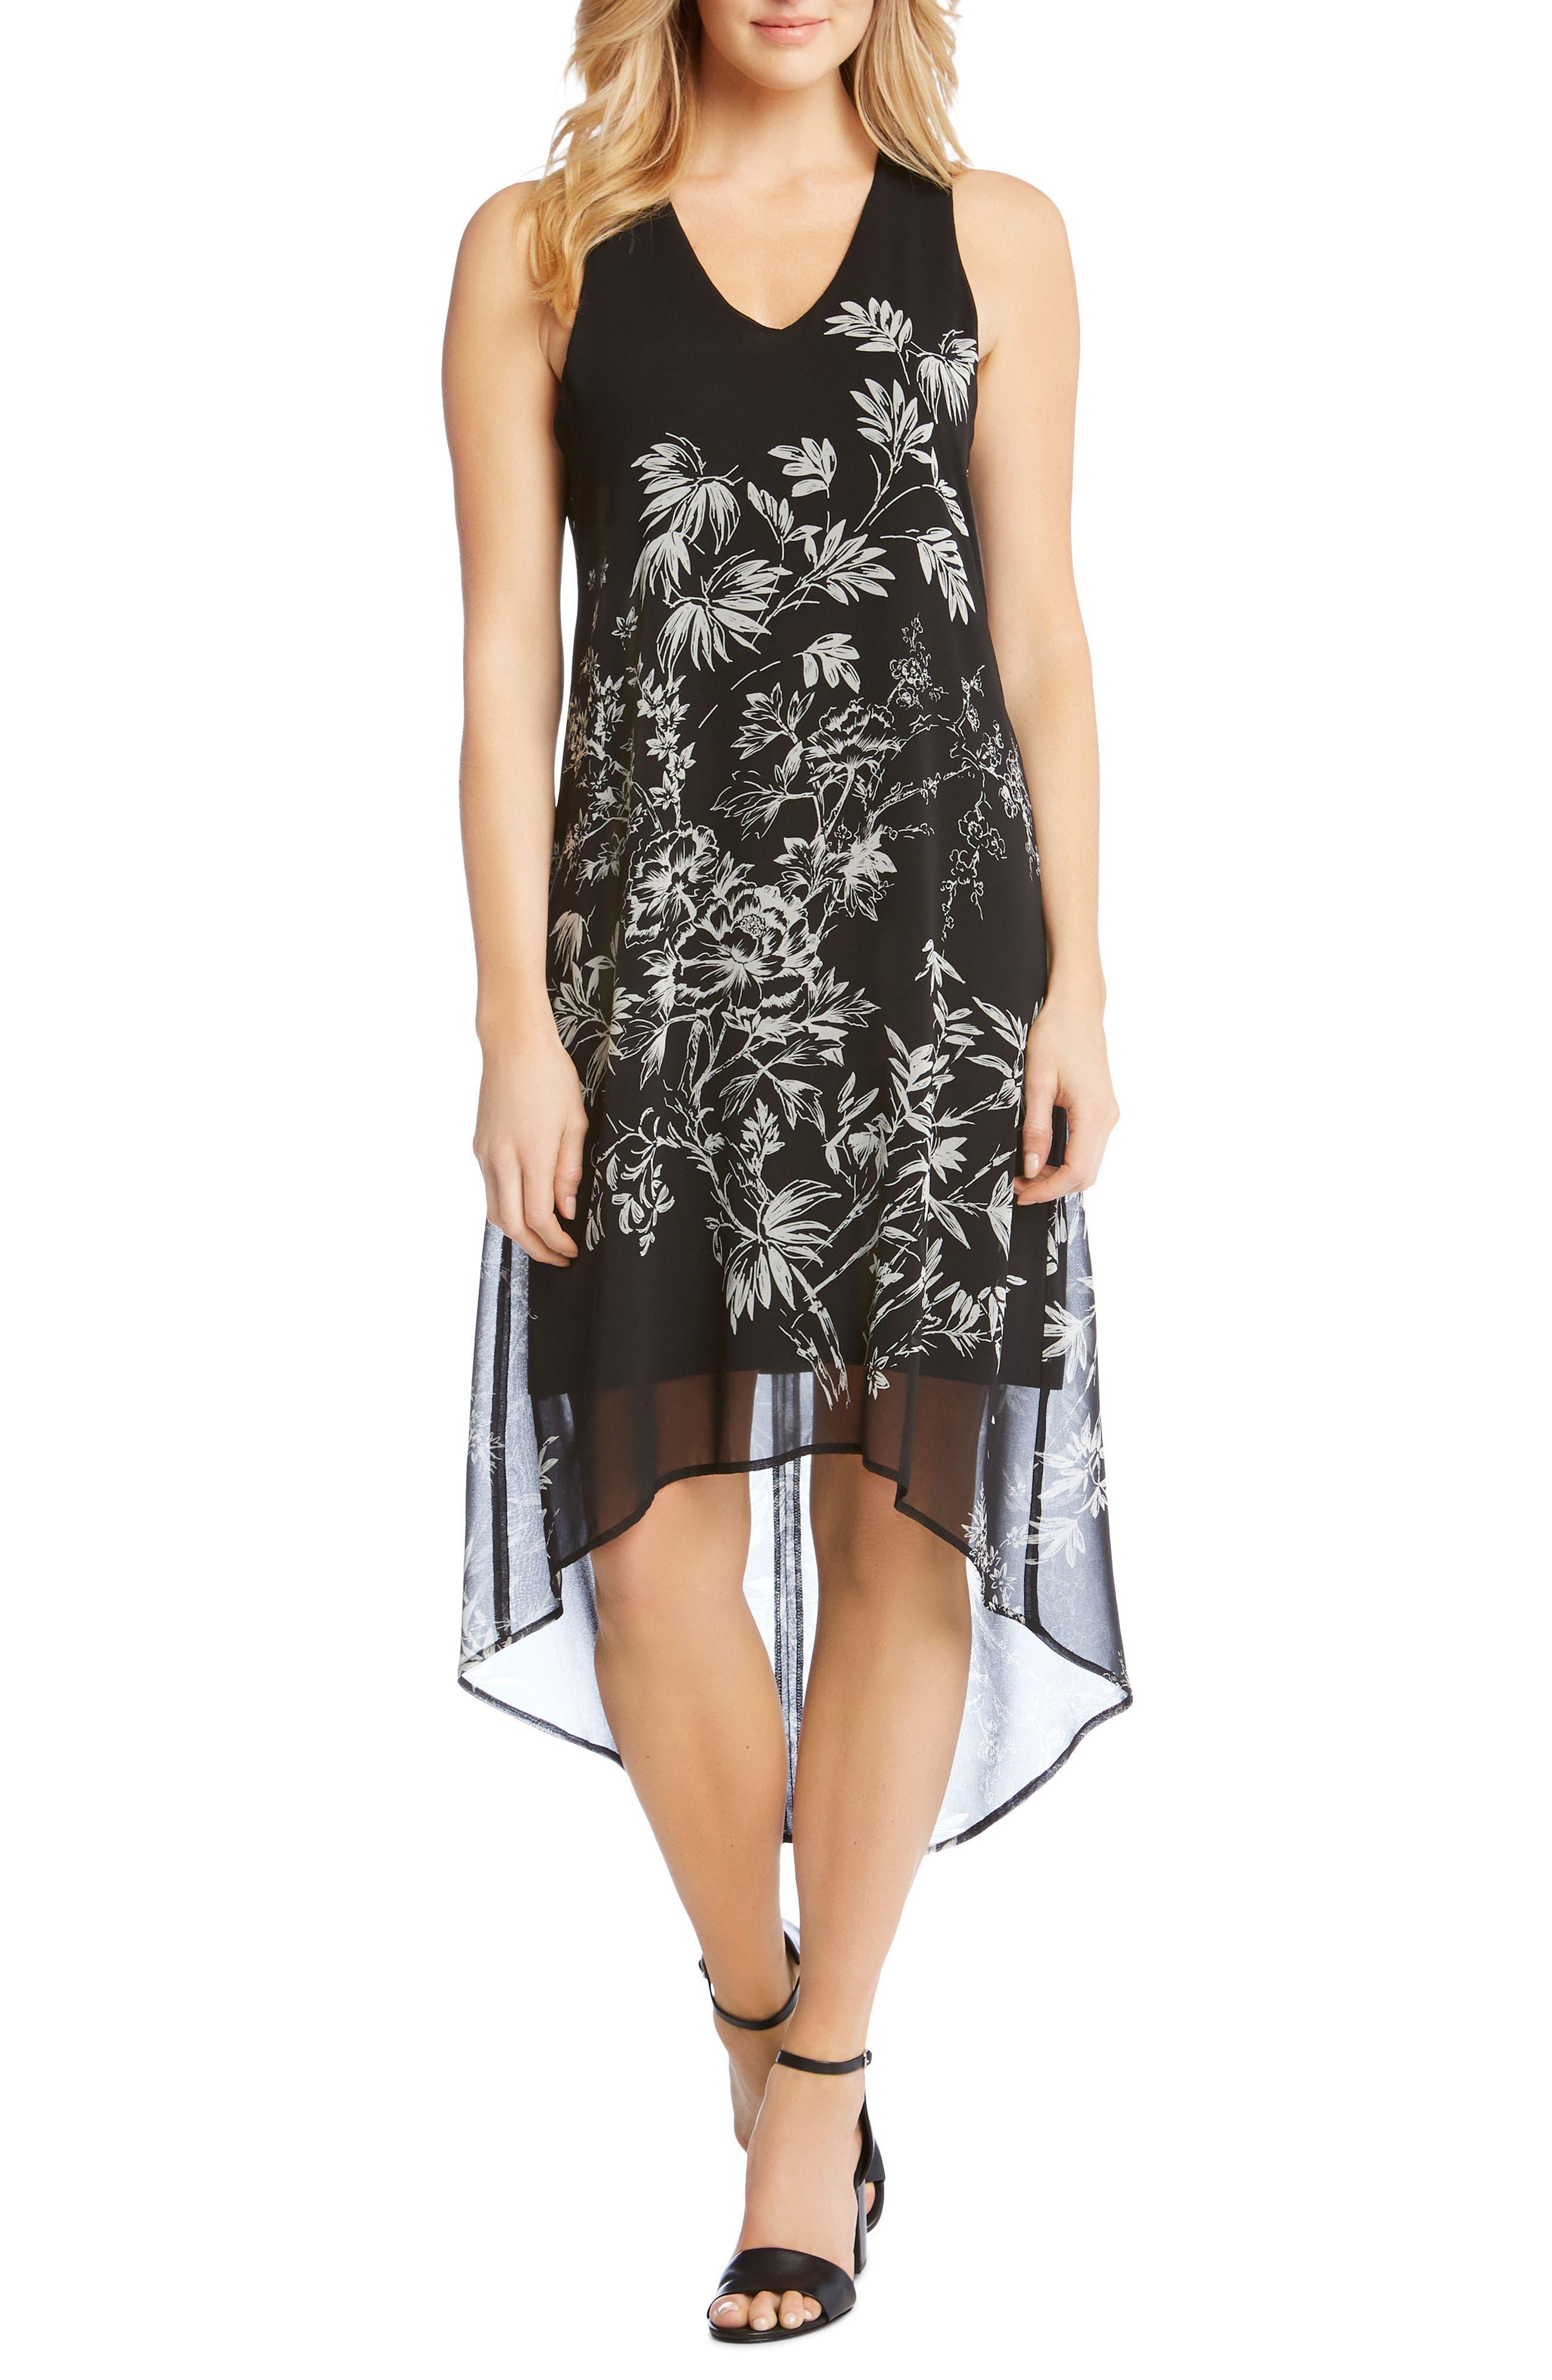 Sketched Floral Dress,                         Main,                         color, Print